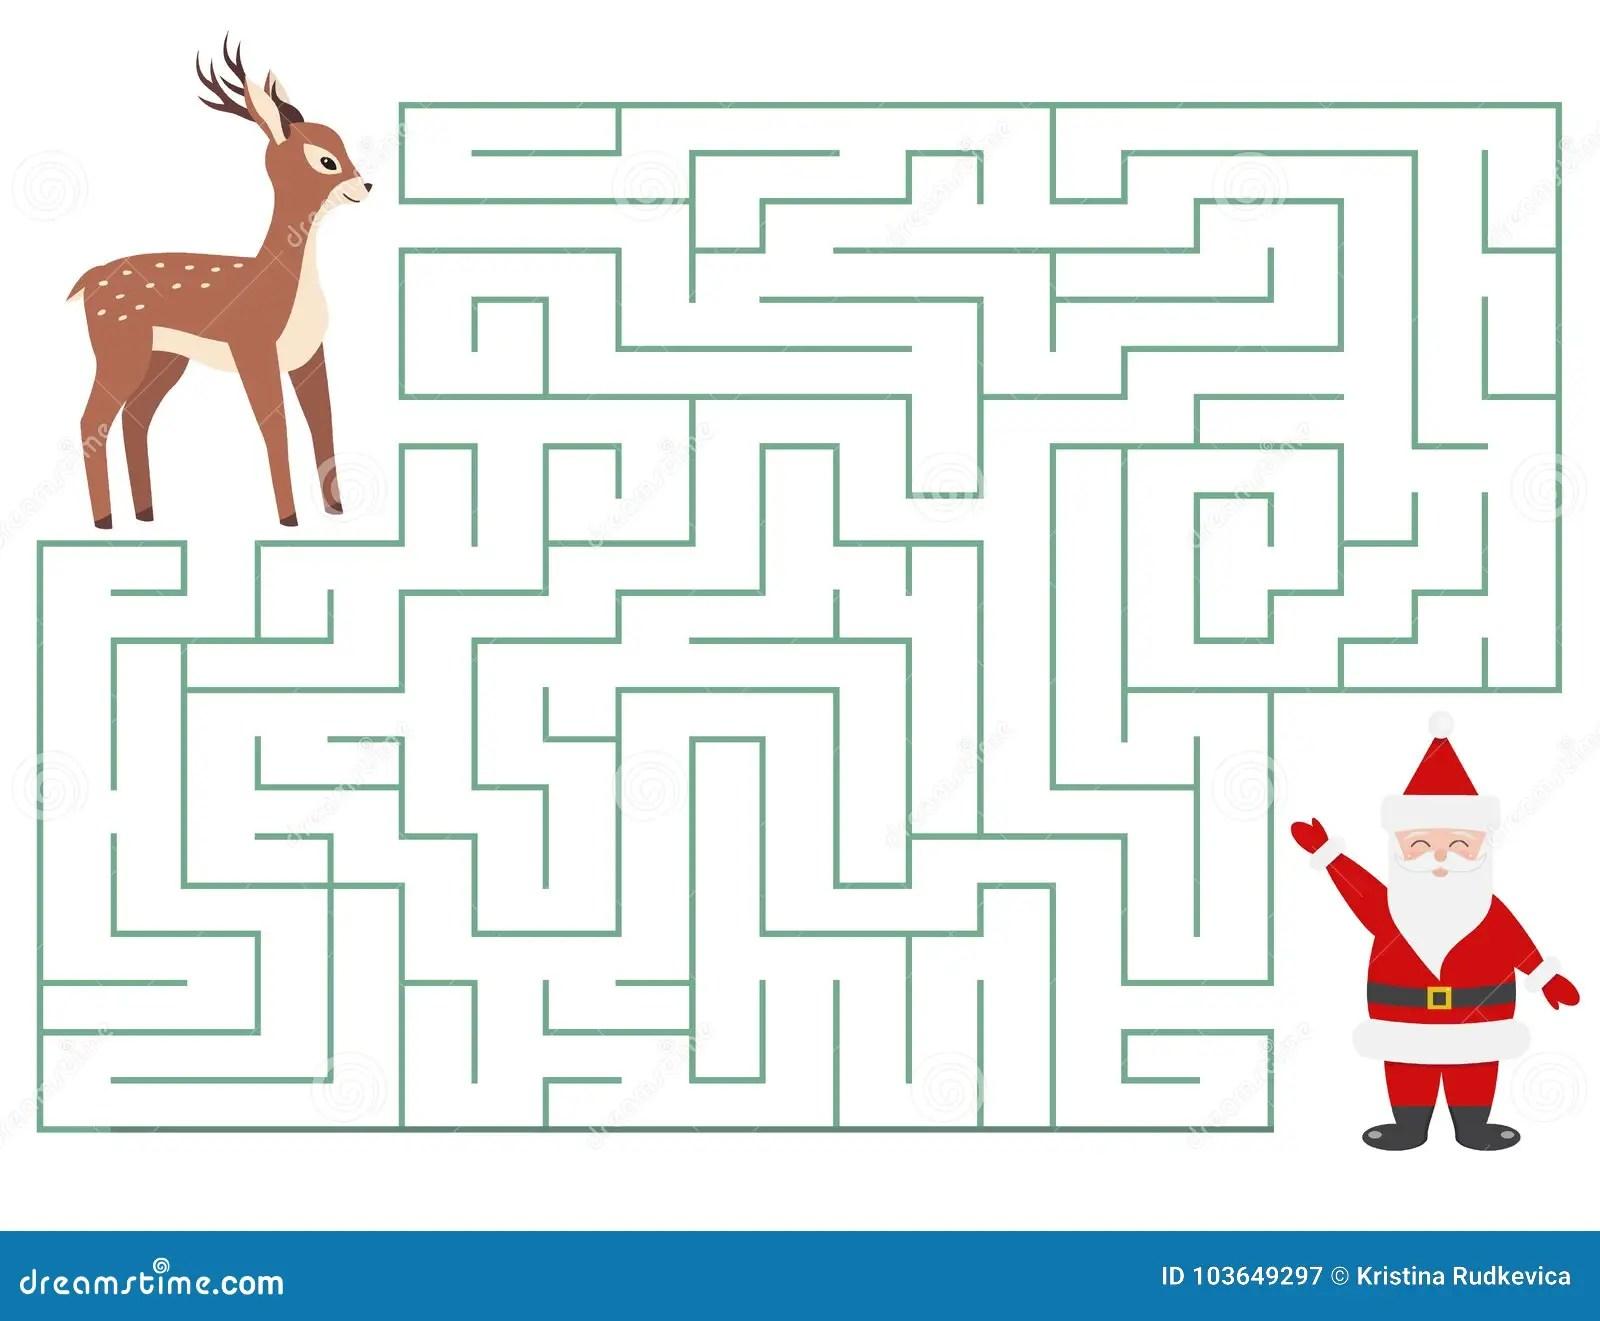 Funny Christmas Maze For Children Stock Vector